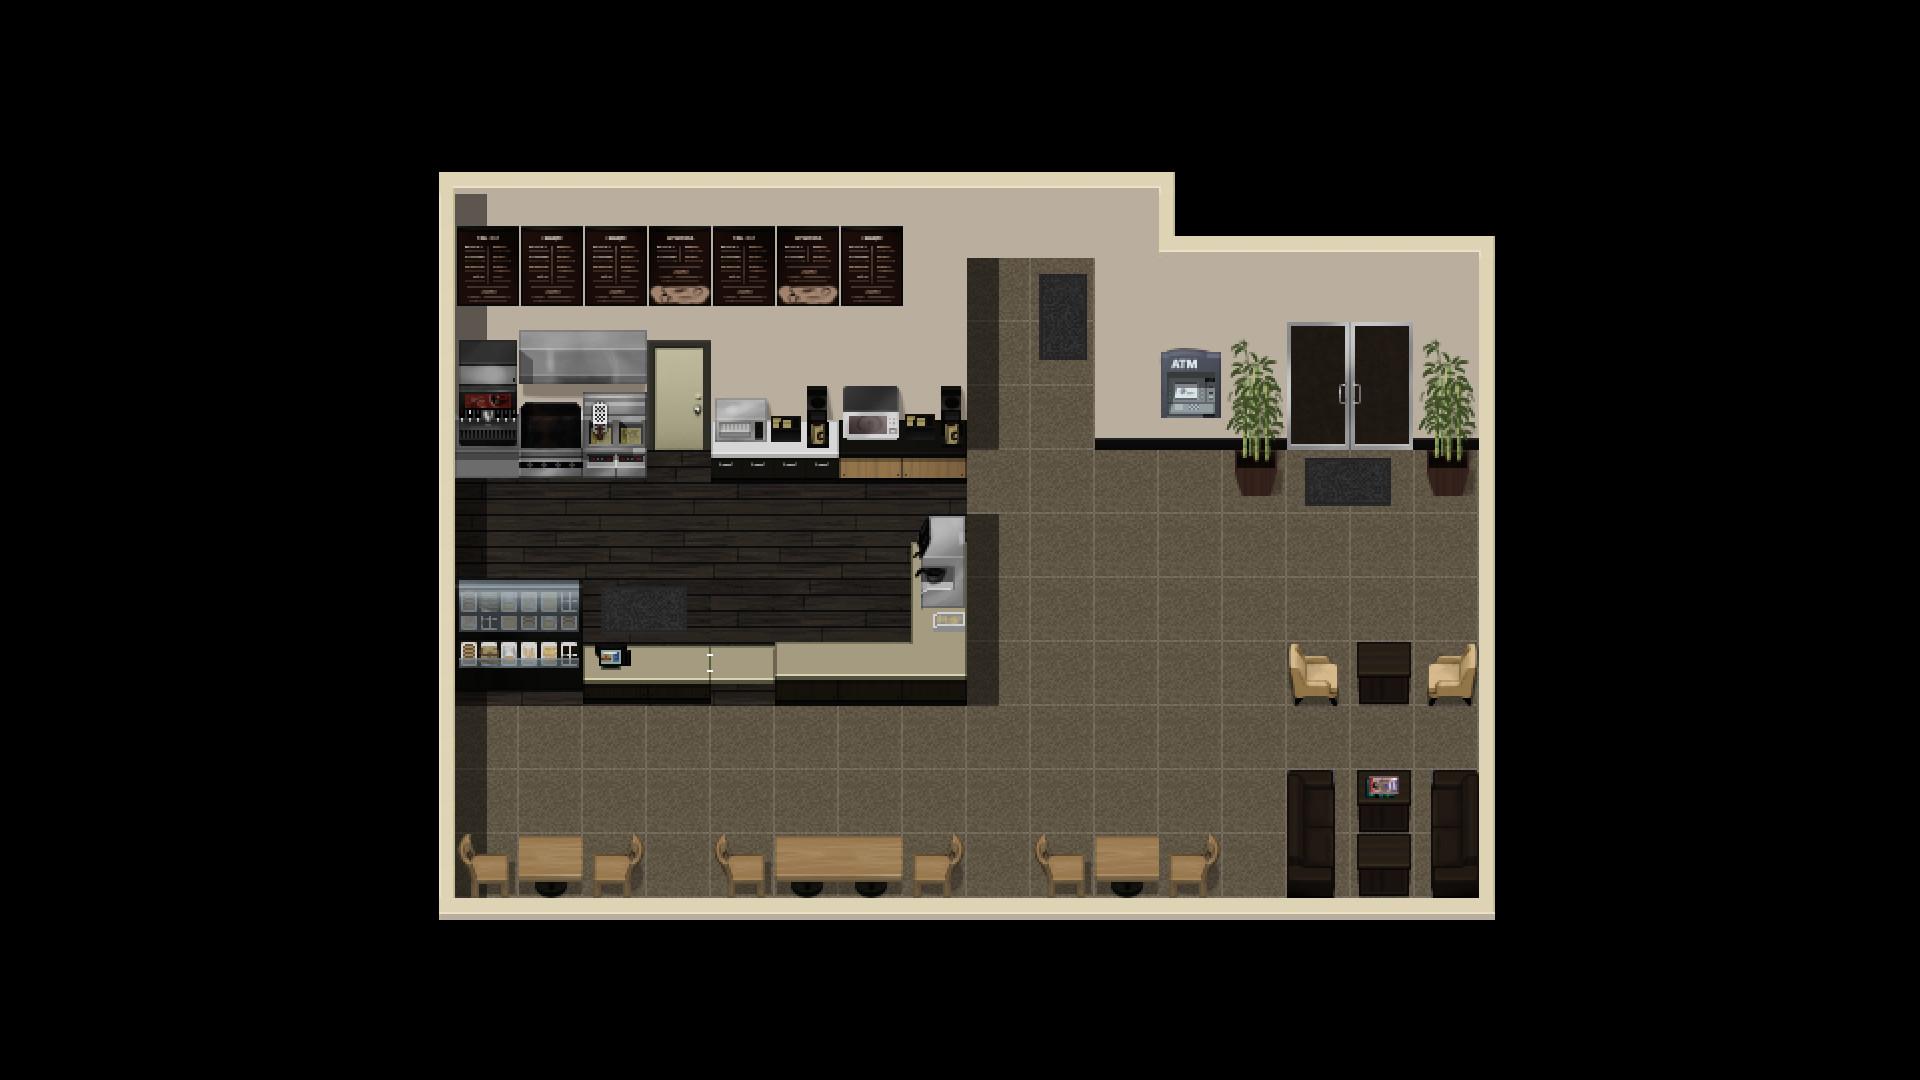 RPG Maker VX Ace - Always Sometimes Monsters Asset Pack screenshot